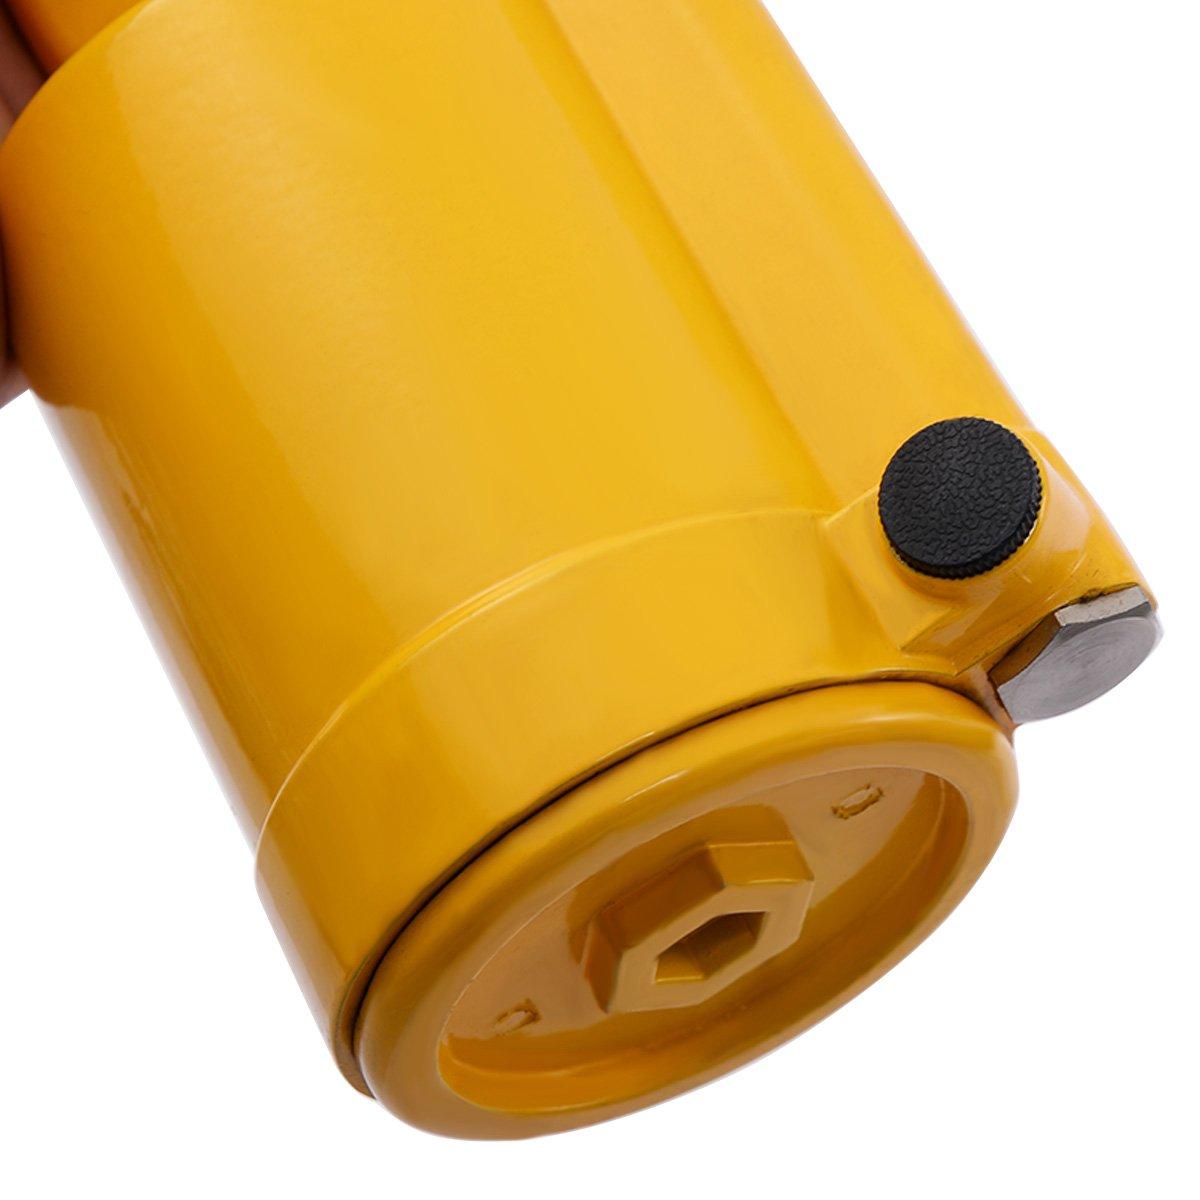 Goplus Pneumatic Air Hydraulic Pop Rivet Gun Riveter Riveting Tool w/Case - 3/32'', 3/16'', 5/32'', 1/8'' by Goplus (Image #1)